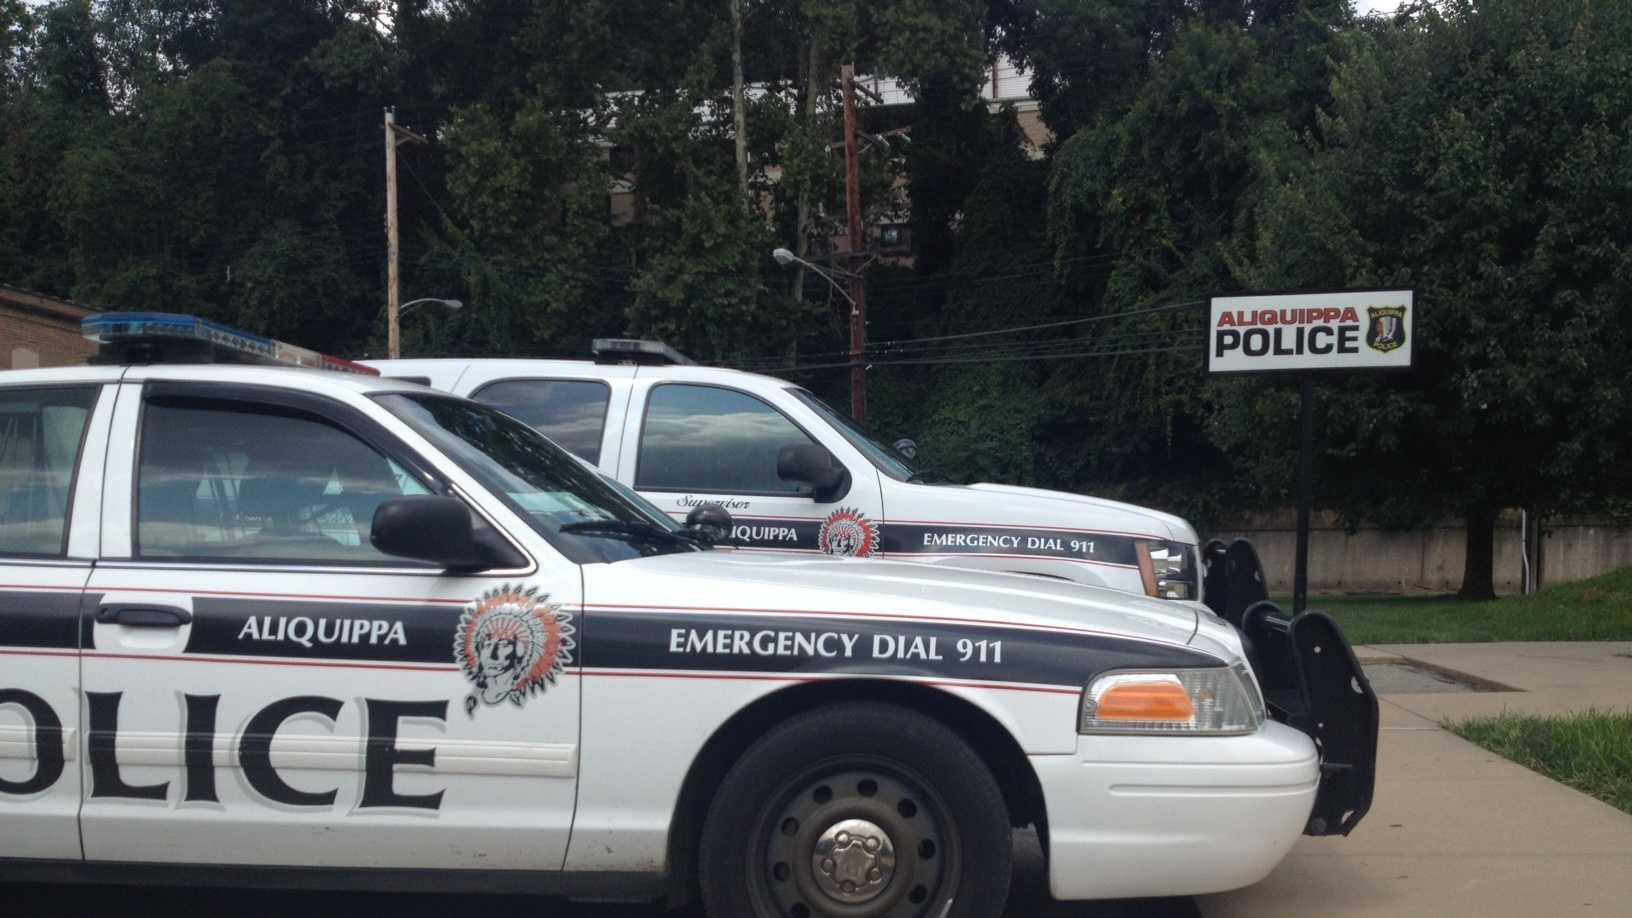 Aliquippa police cars